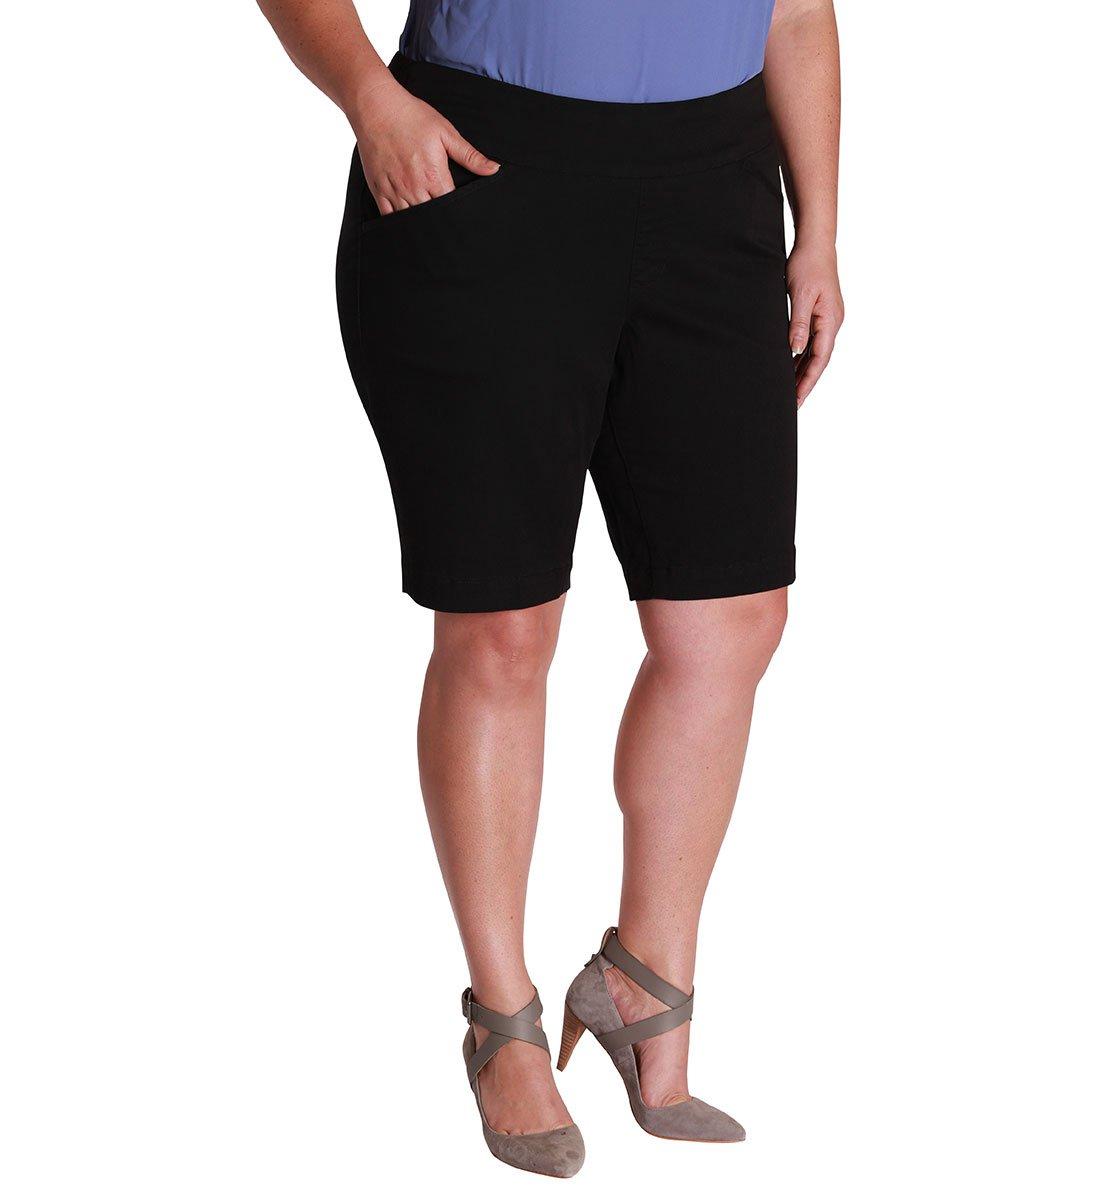 Jag Jeans Women's Plus Size Ainsley Pull on Bermuda Short, Black, 20W